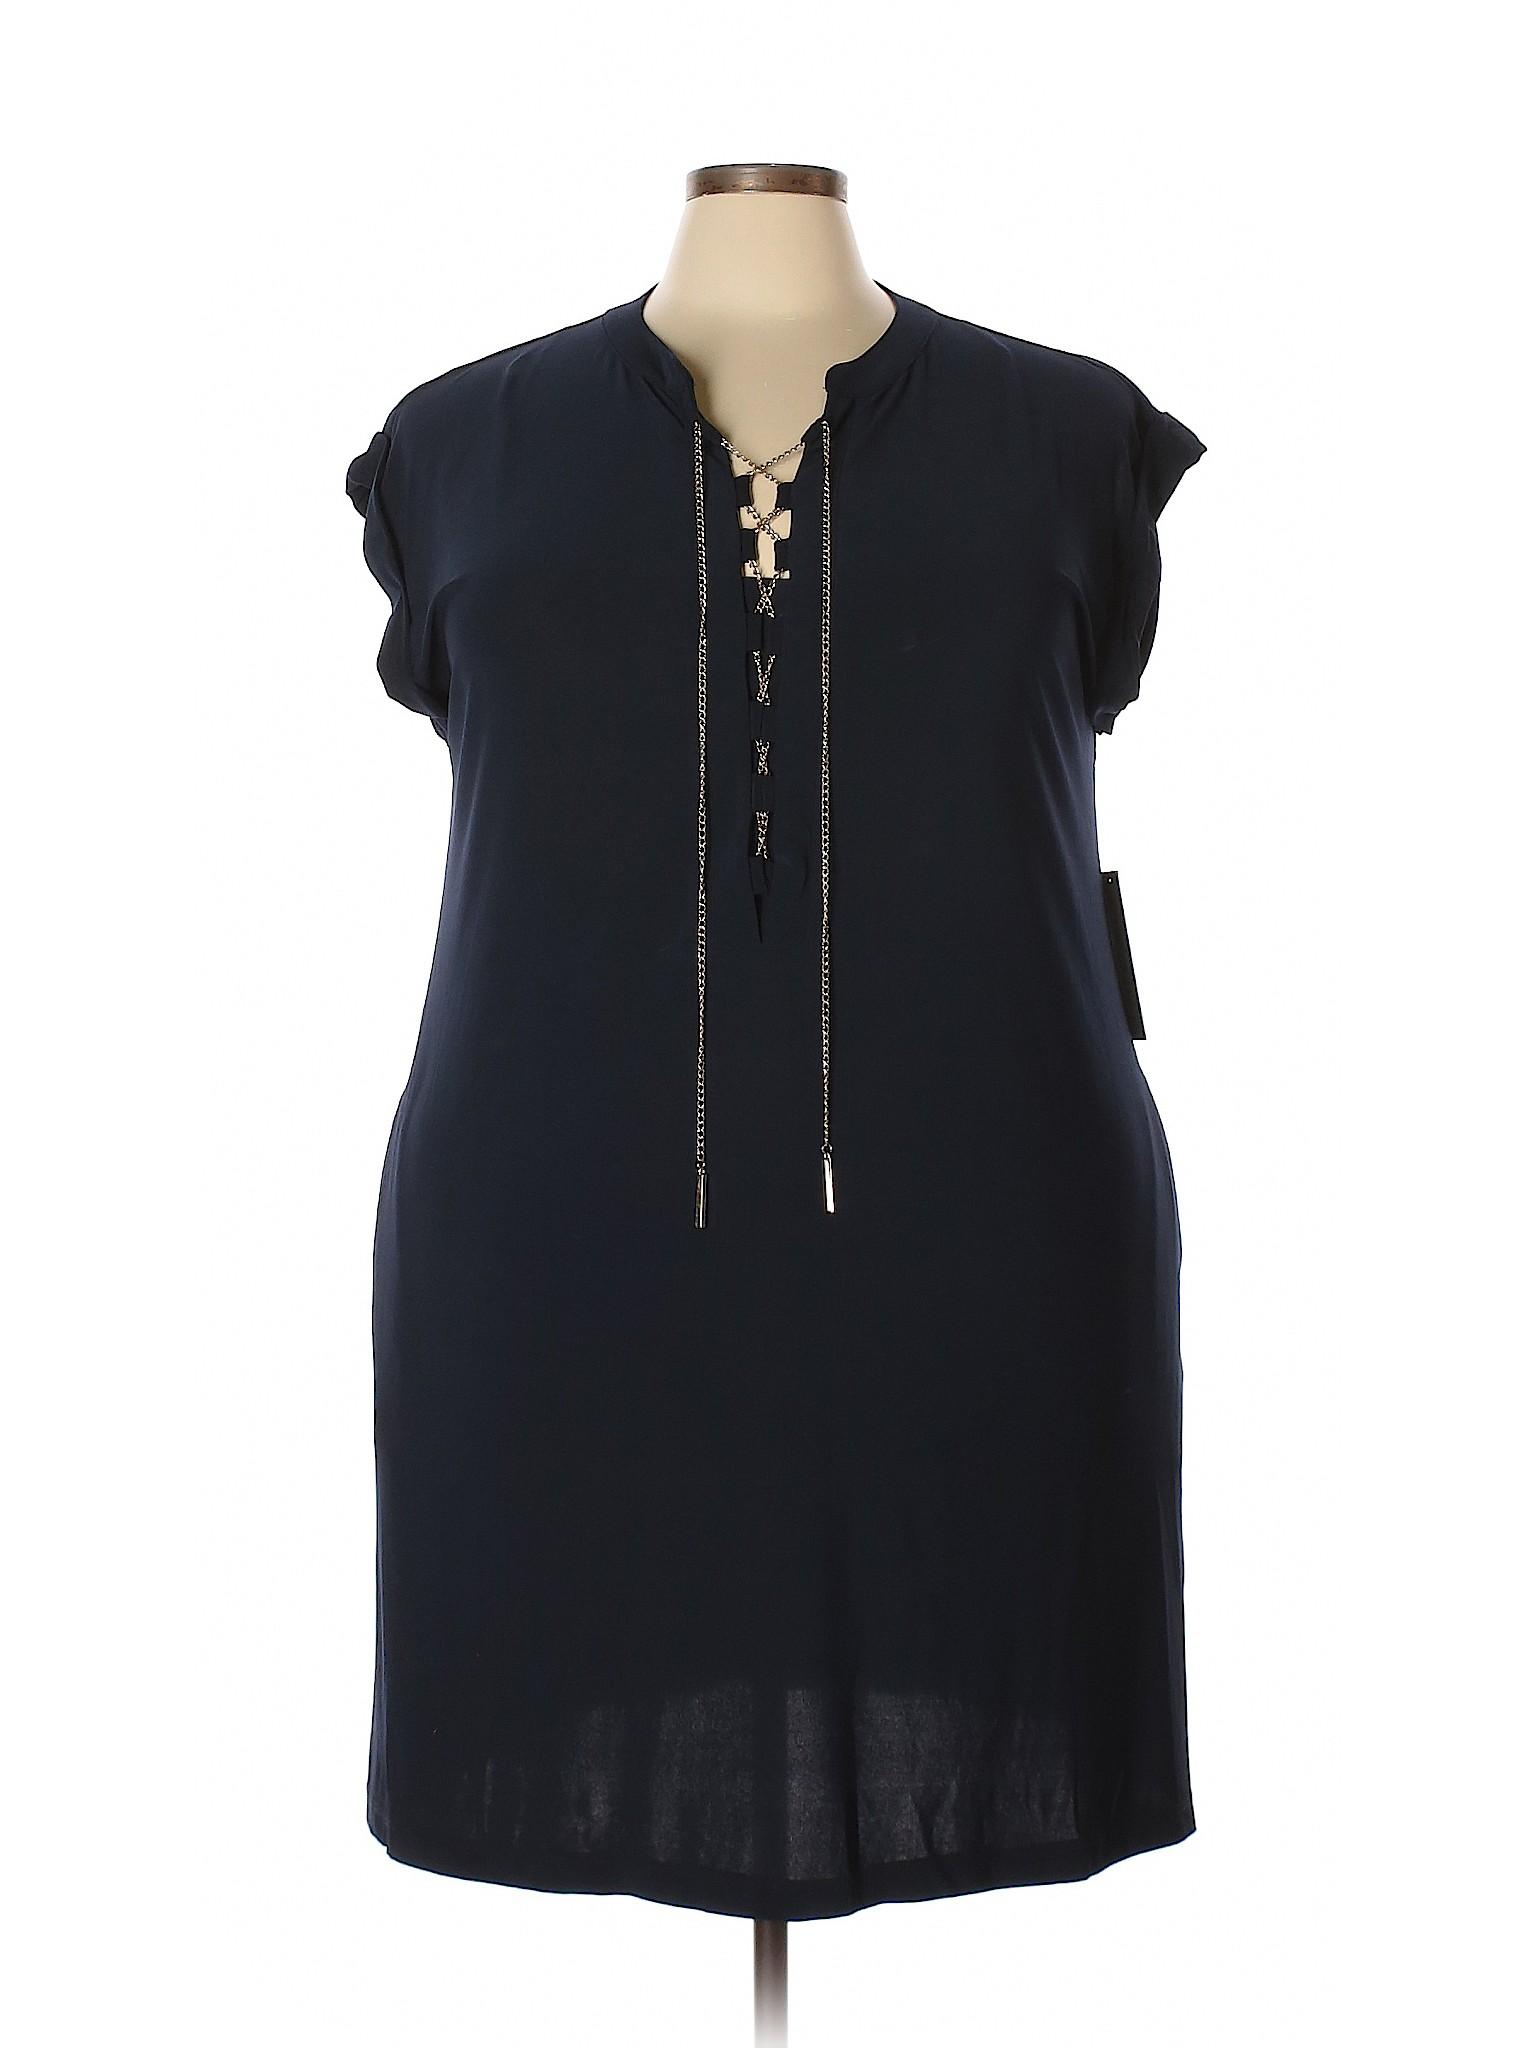 Michele Boutique Dress winter Casual Emma amp; qx4txp7